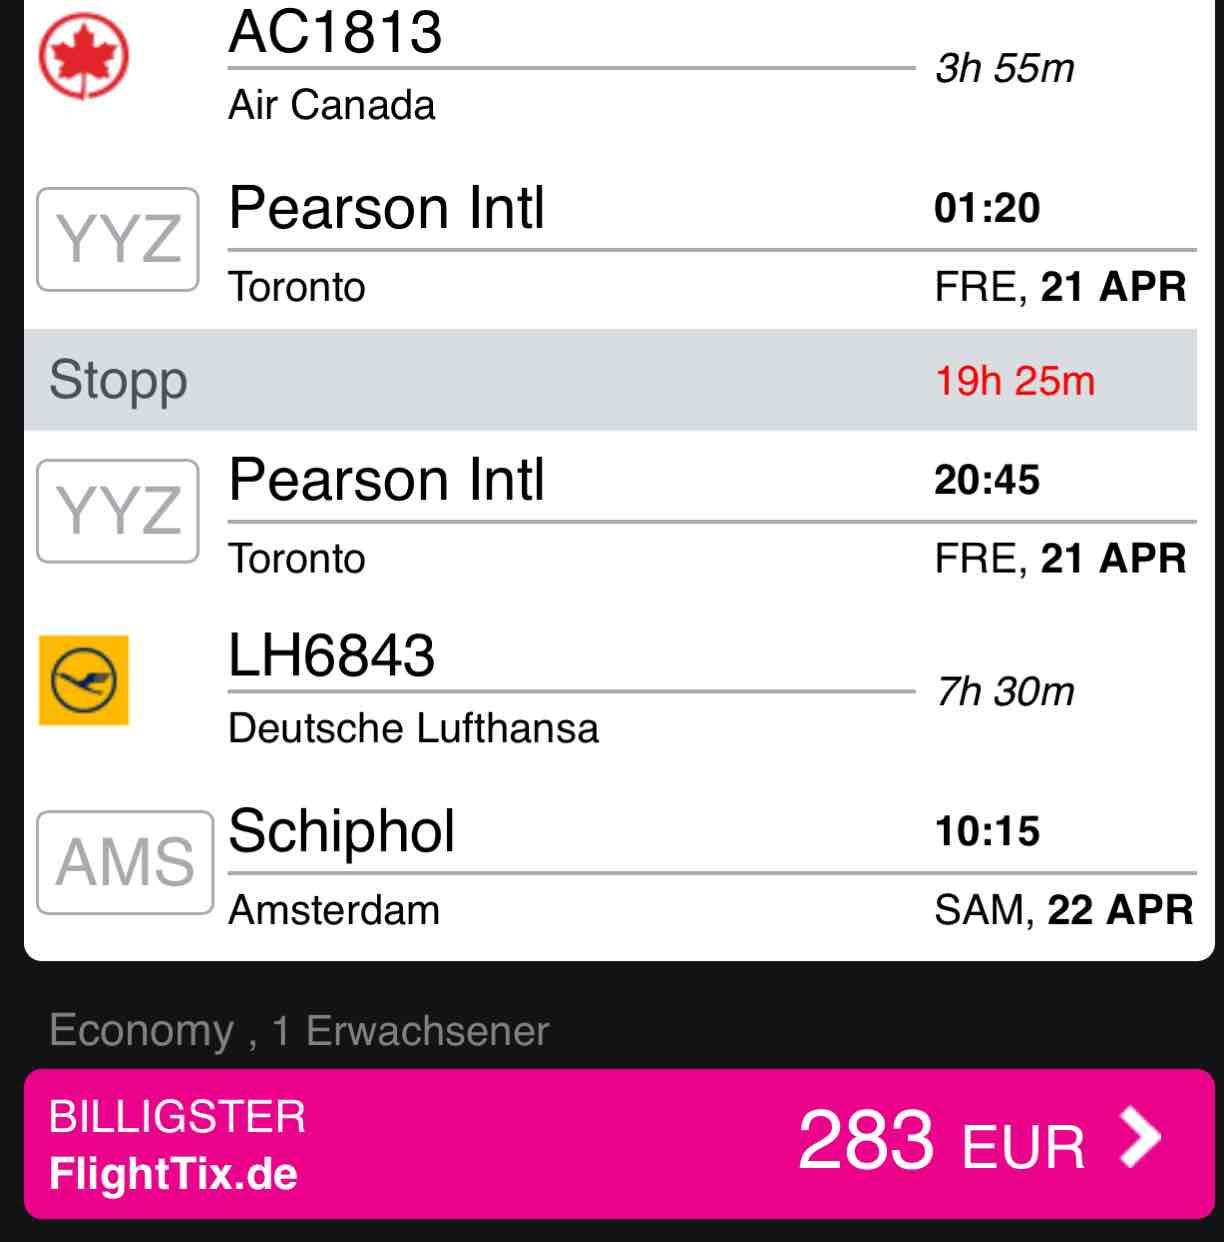 Von Amsterdam nach Cancun, Mexico für €287! Air Canada-Lufthansa